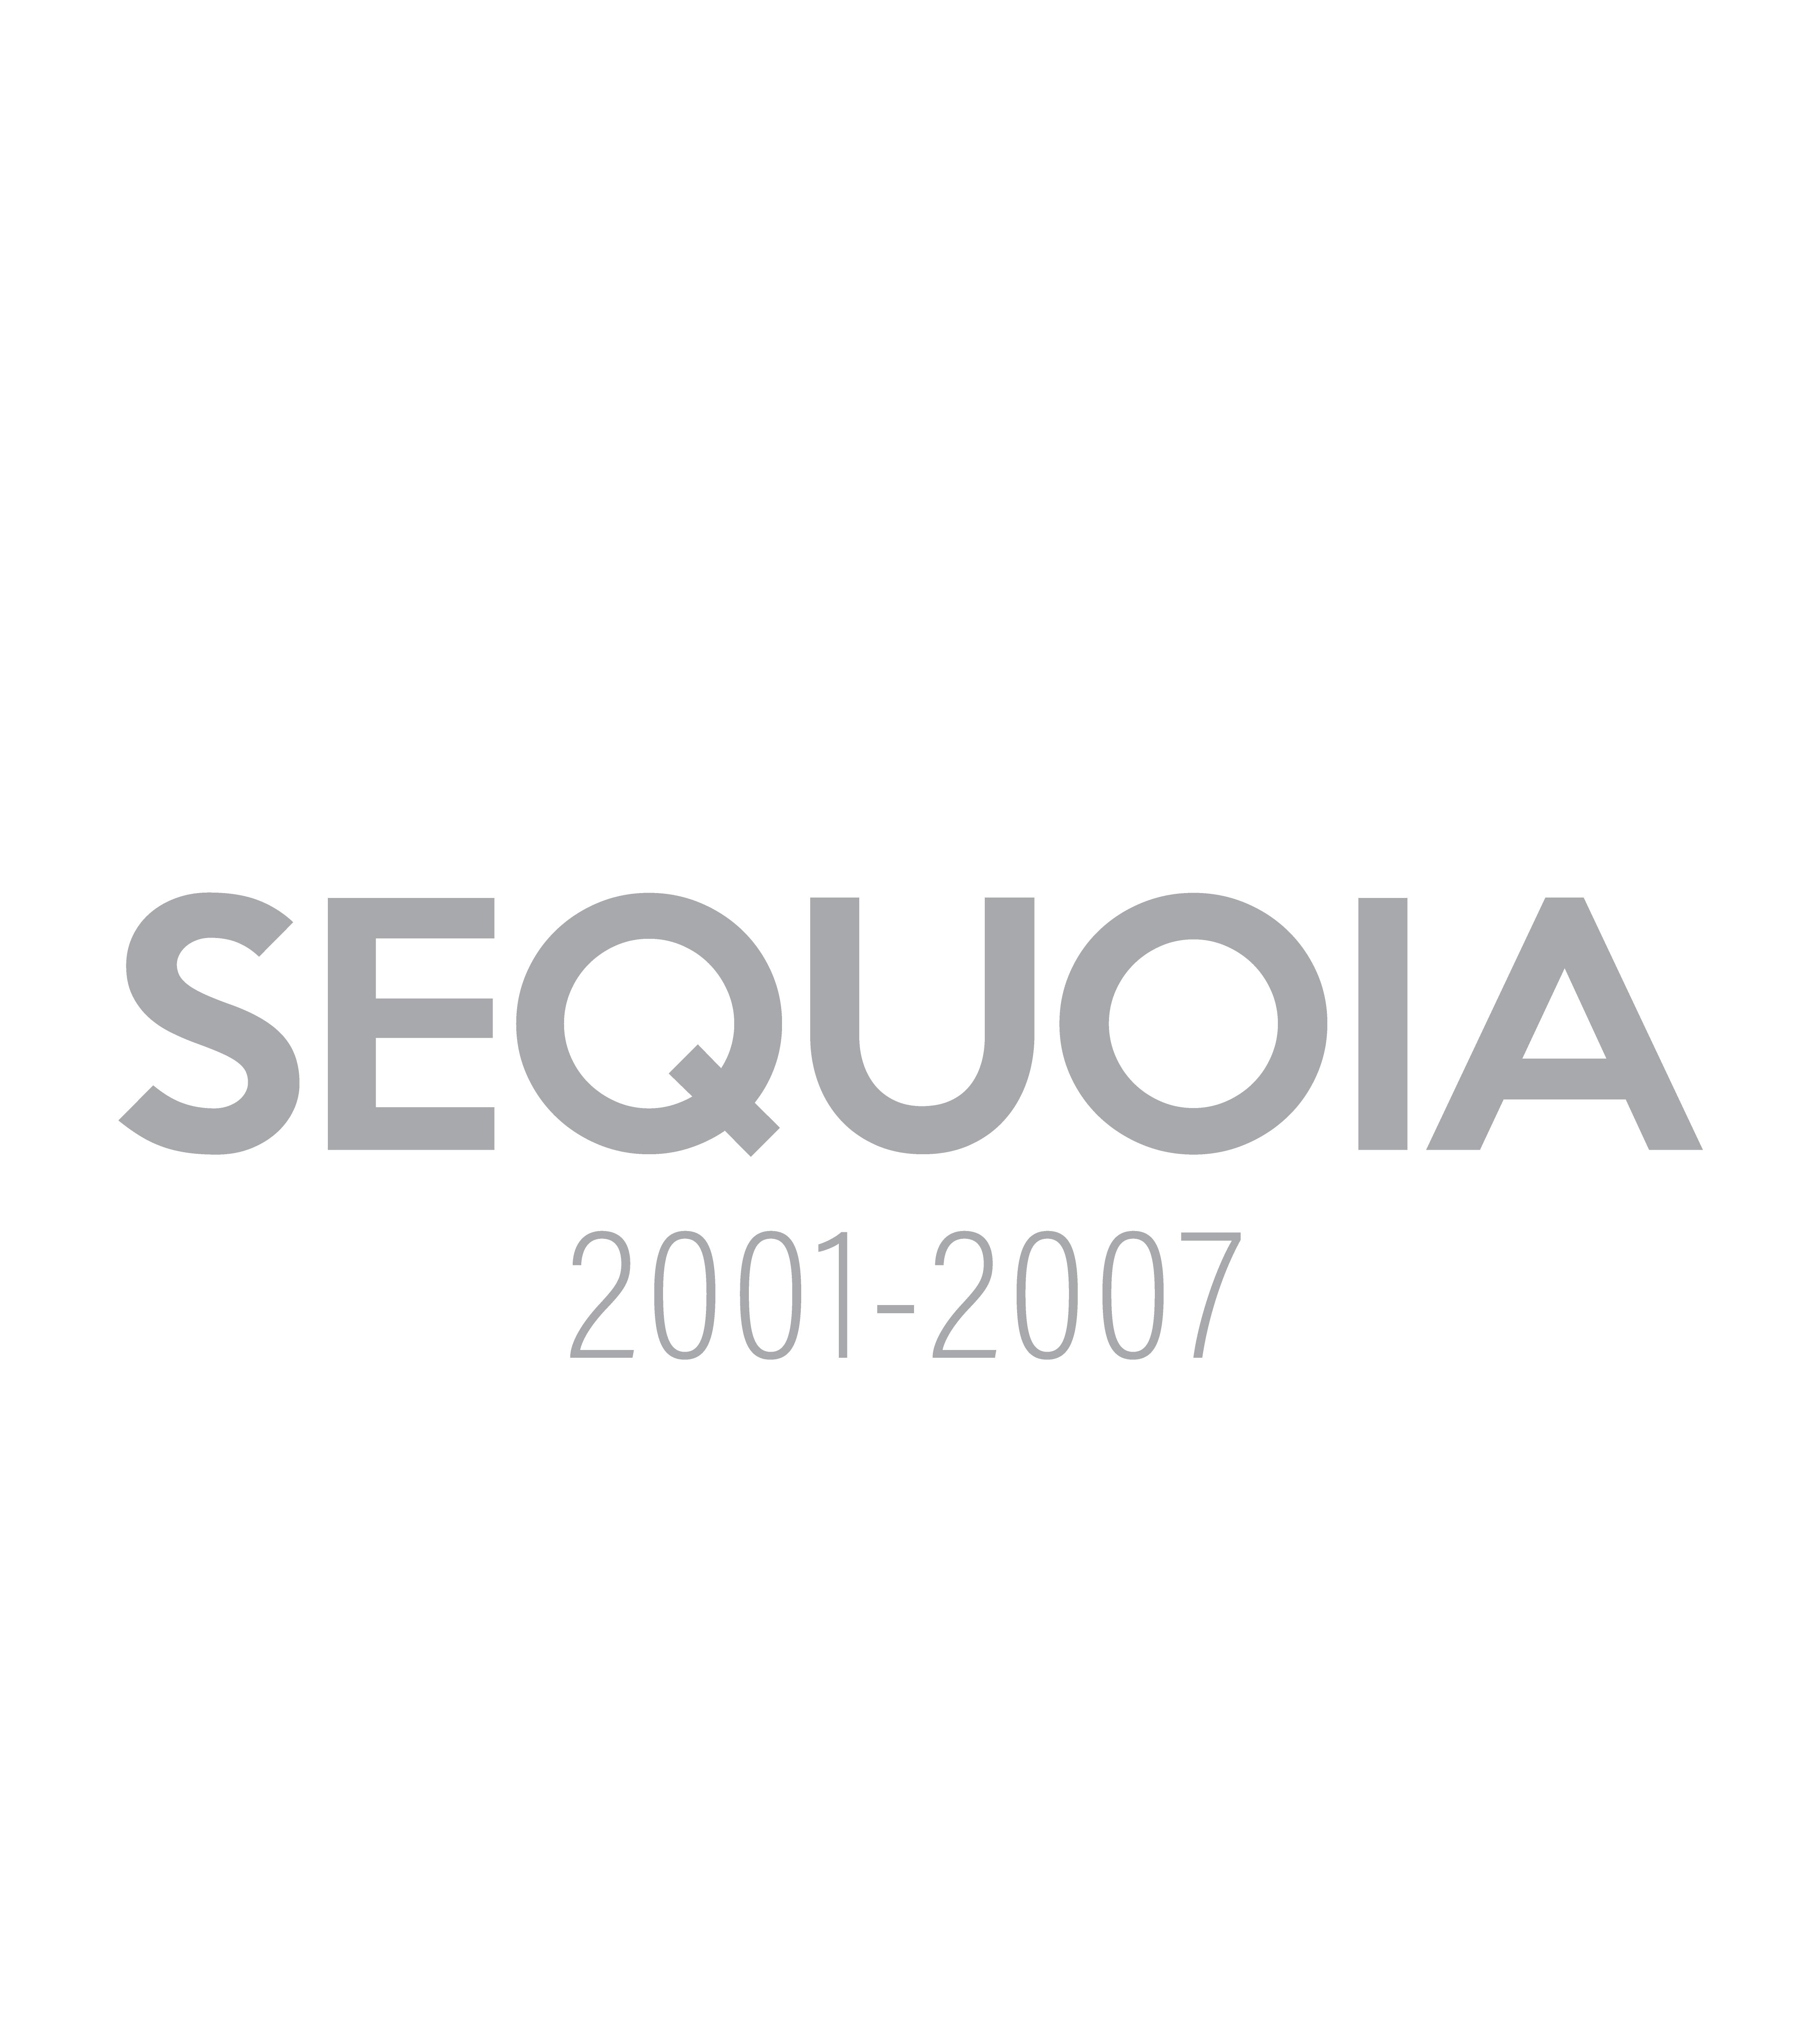 toyota sequoia 2001-2007 gobi gallery image